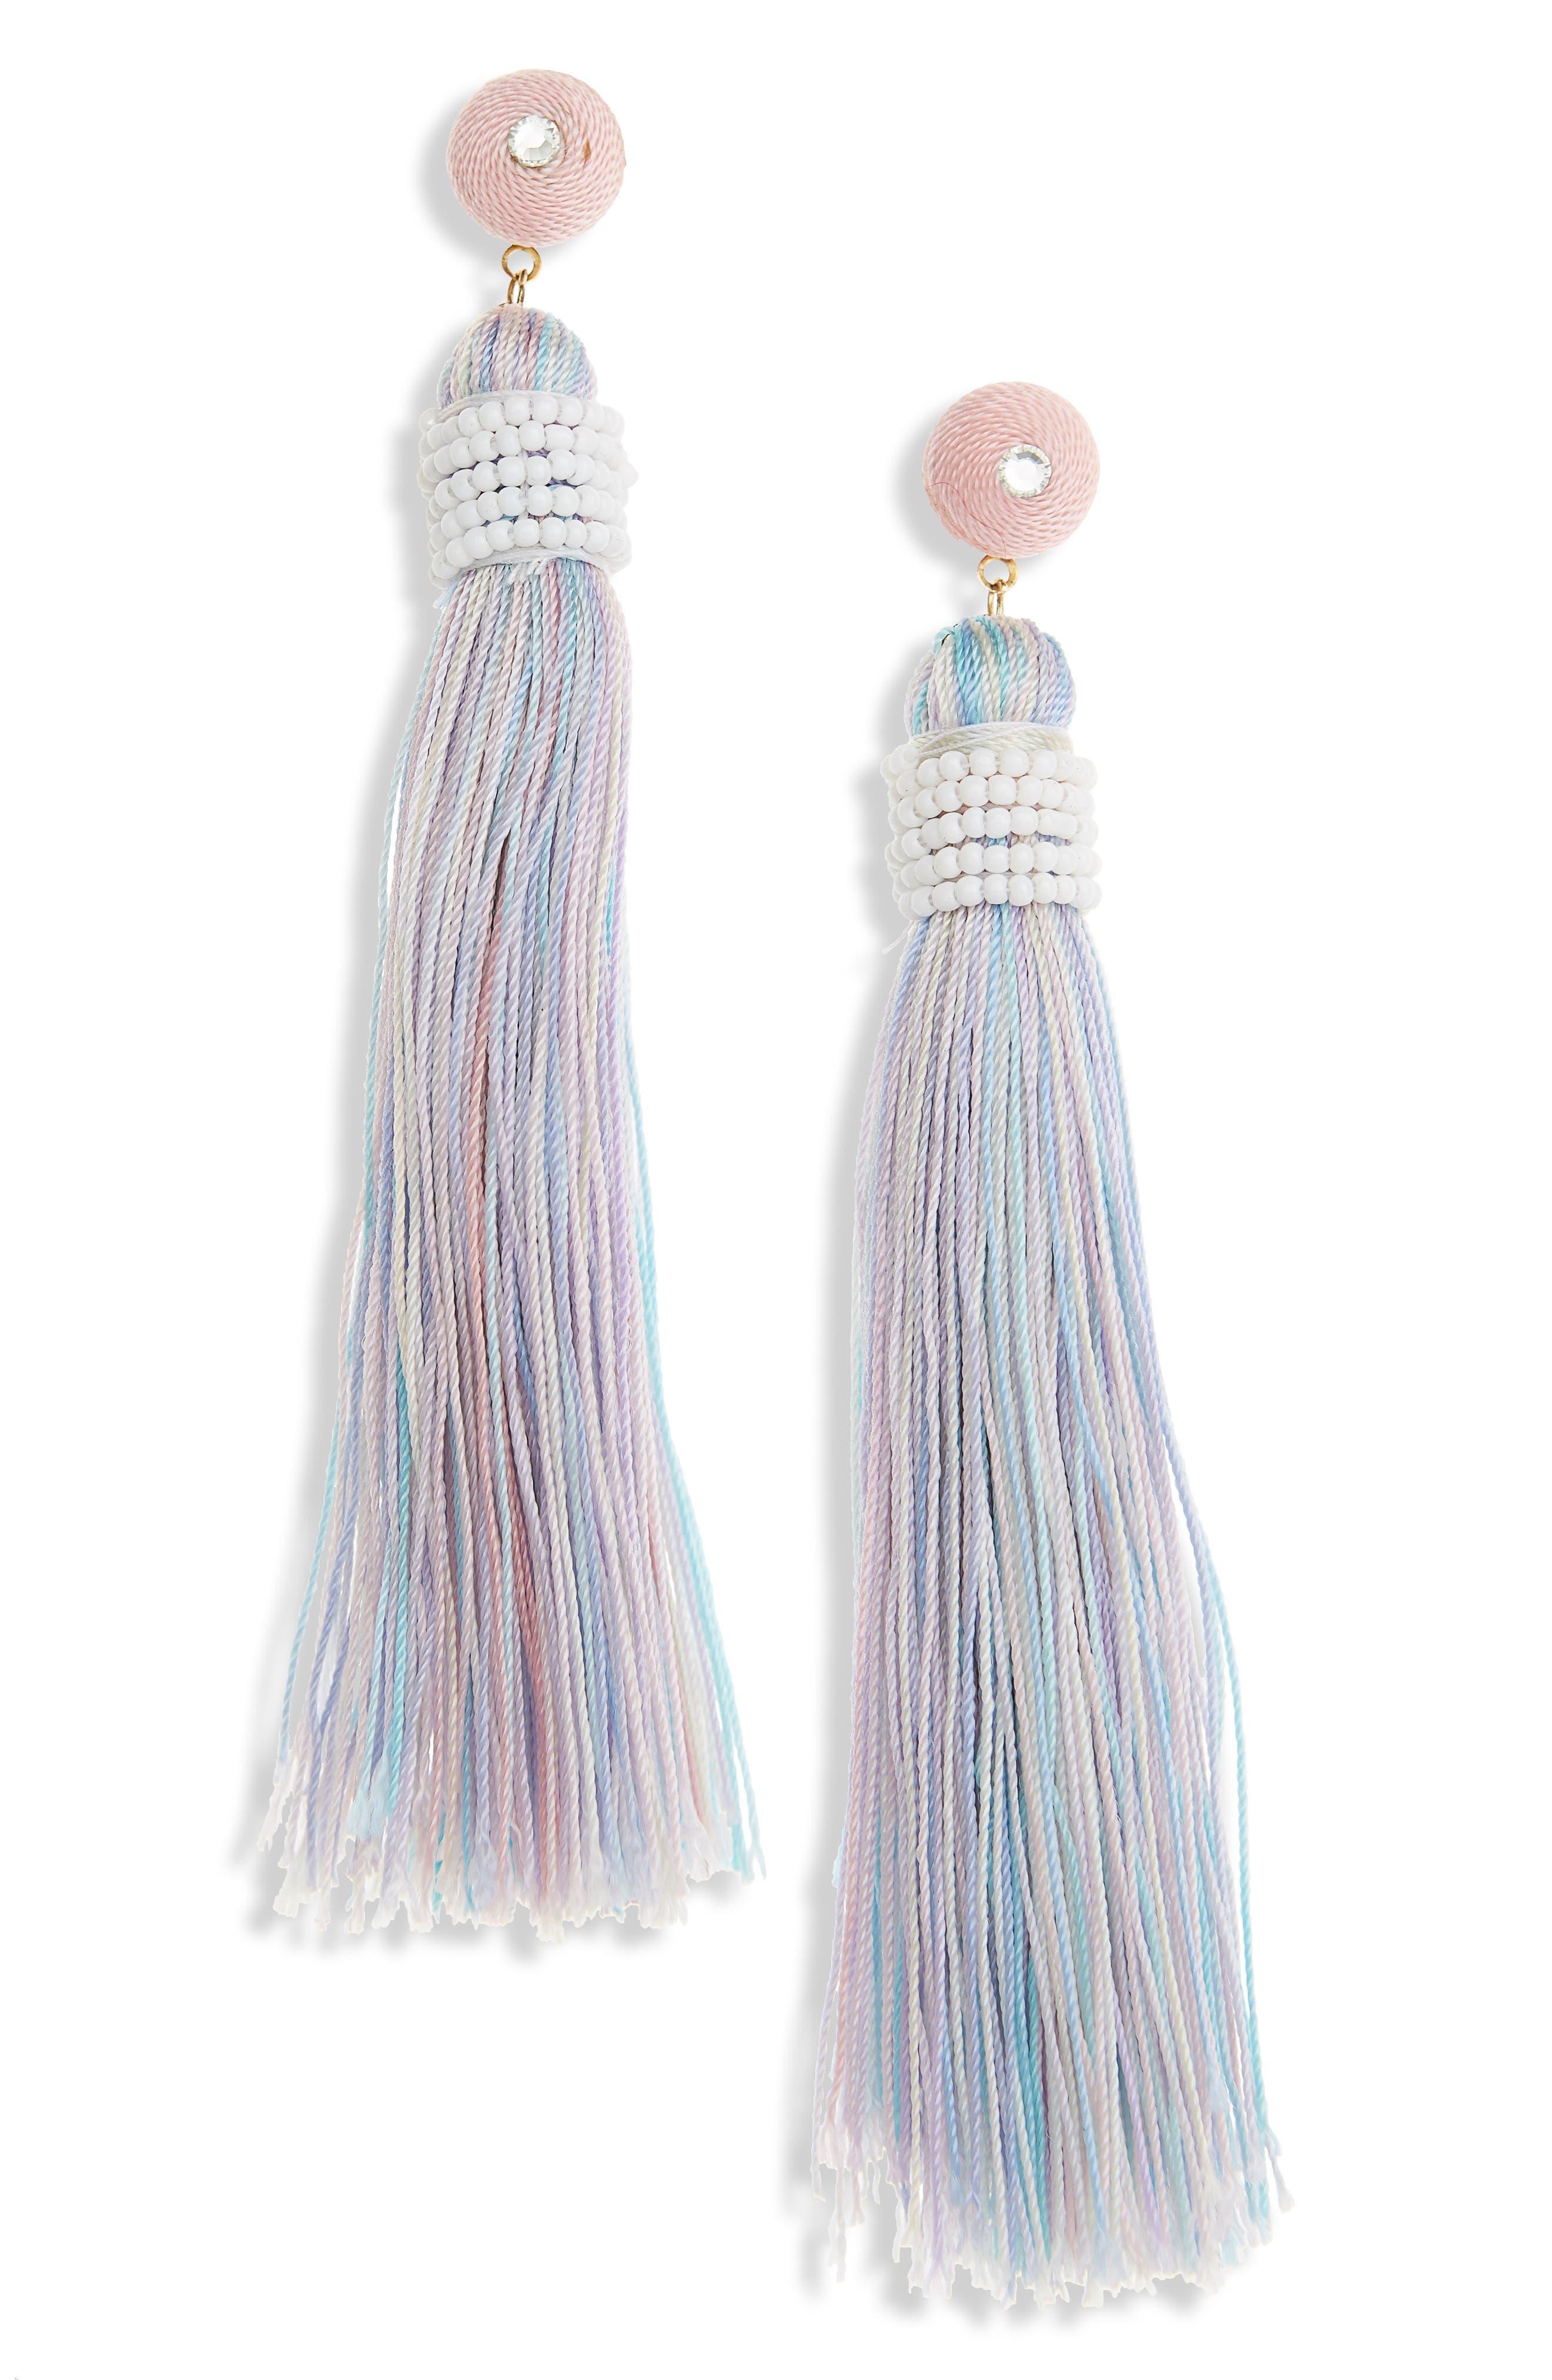 Beaded Wrap Tassel Earrings,                         Main,                         color,